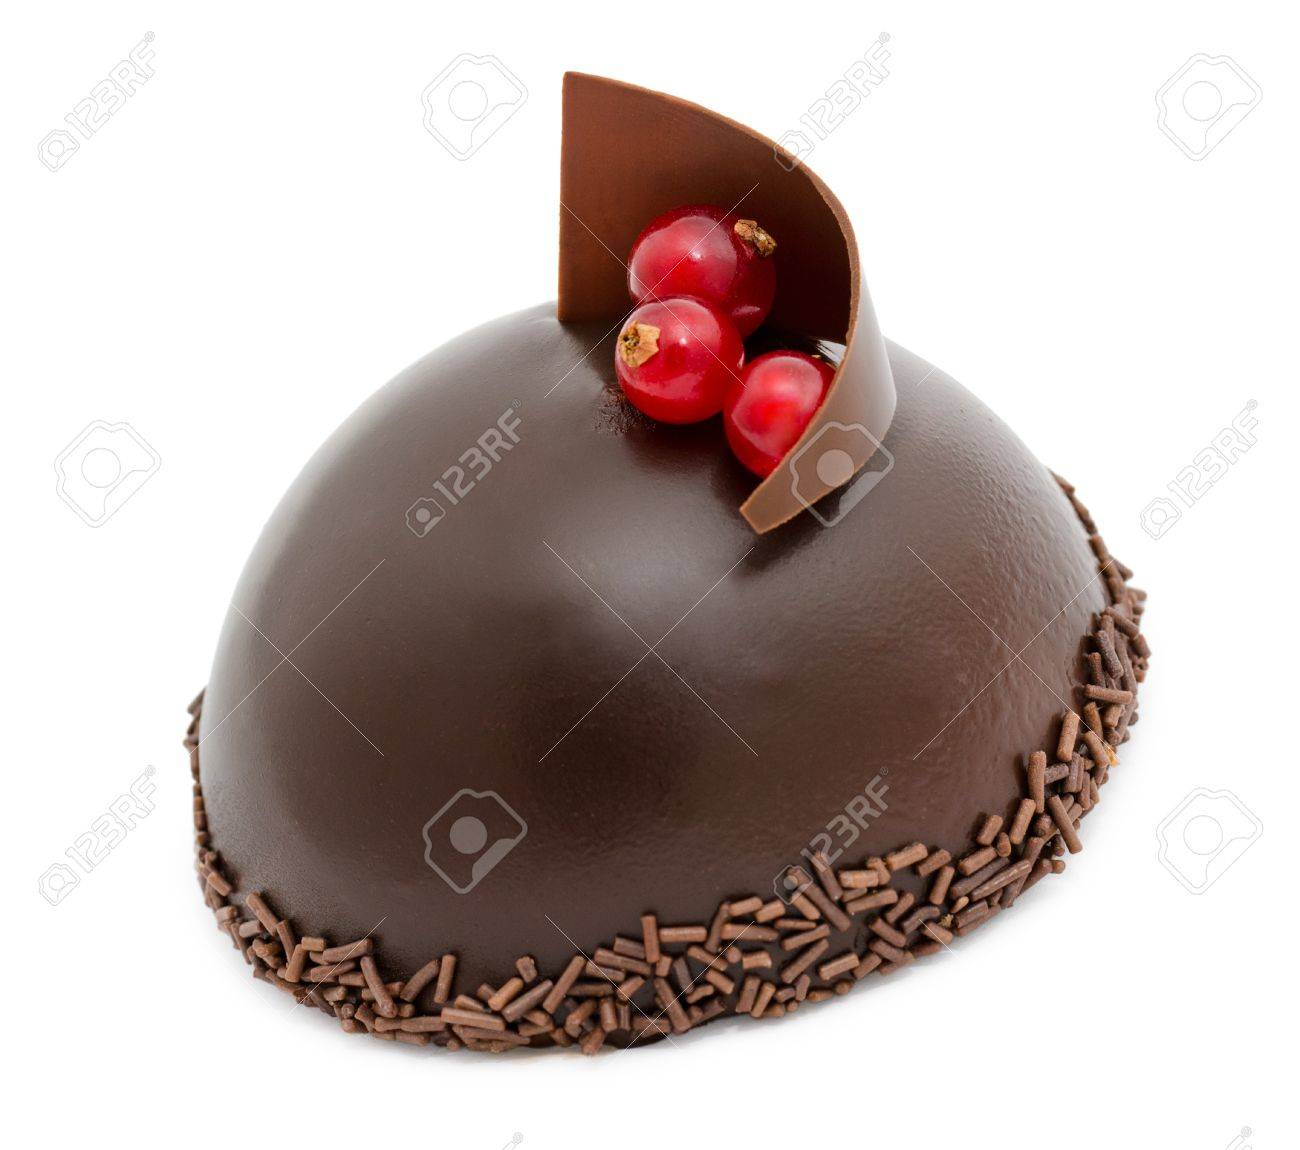 a fresh chocolate cake, over white background Stock Photo - 13609319